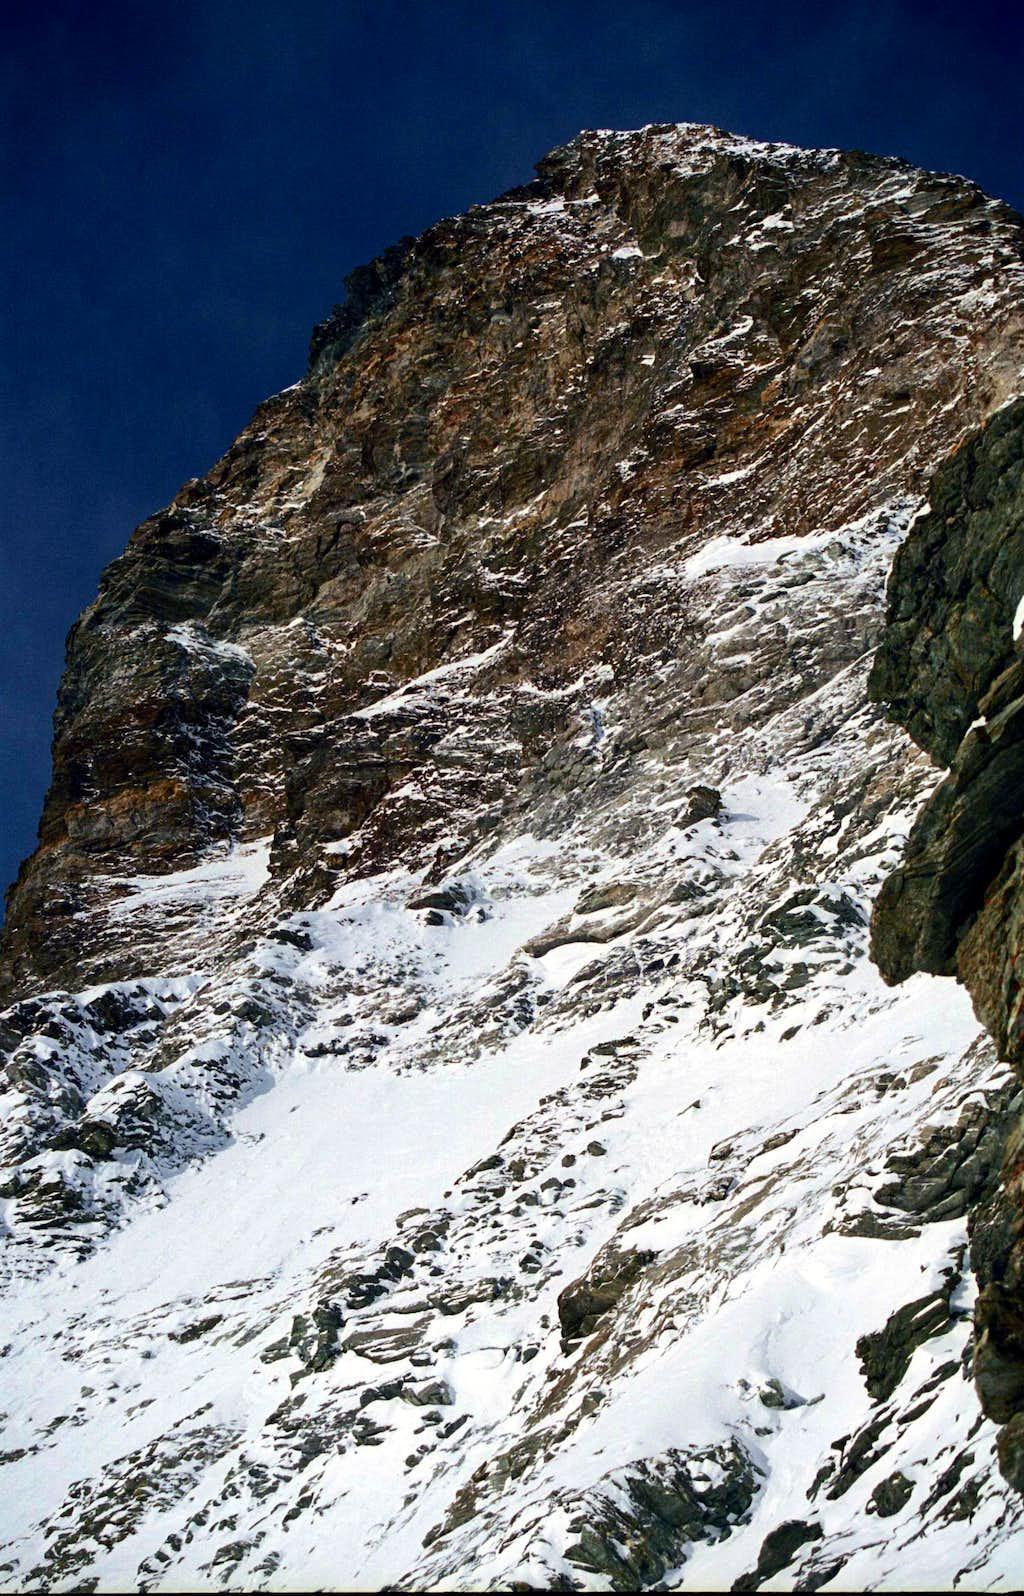 Matterhorn's summit Winter